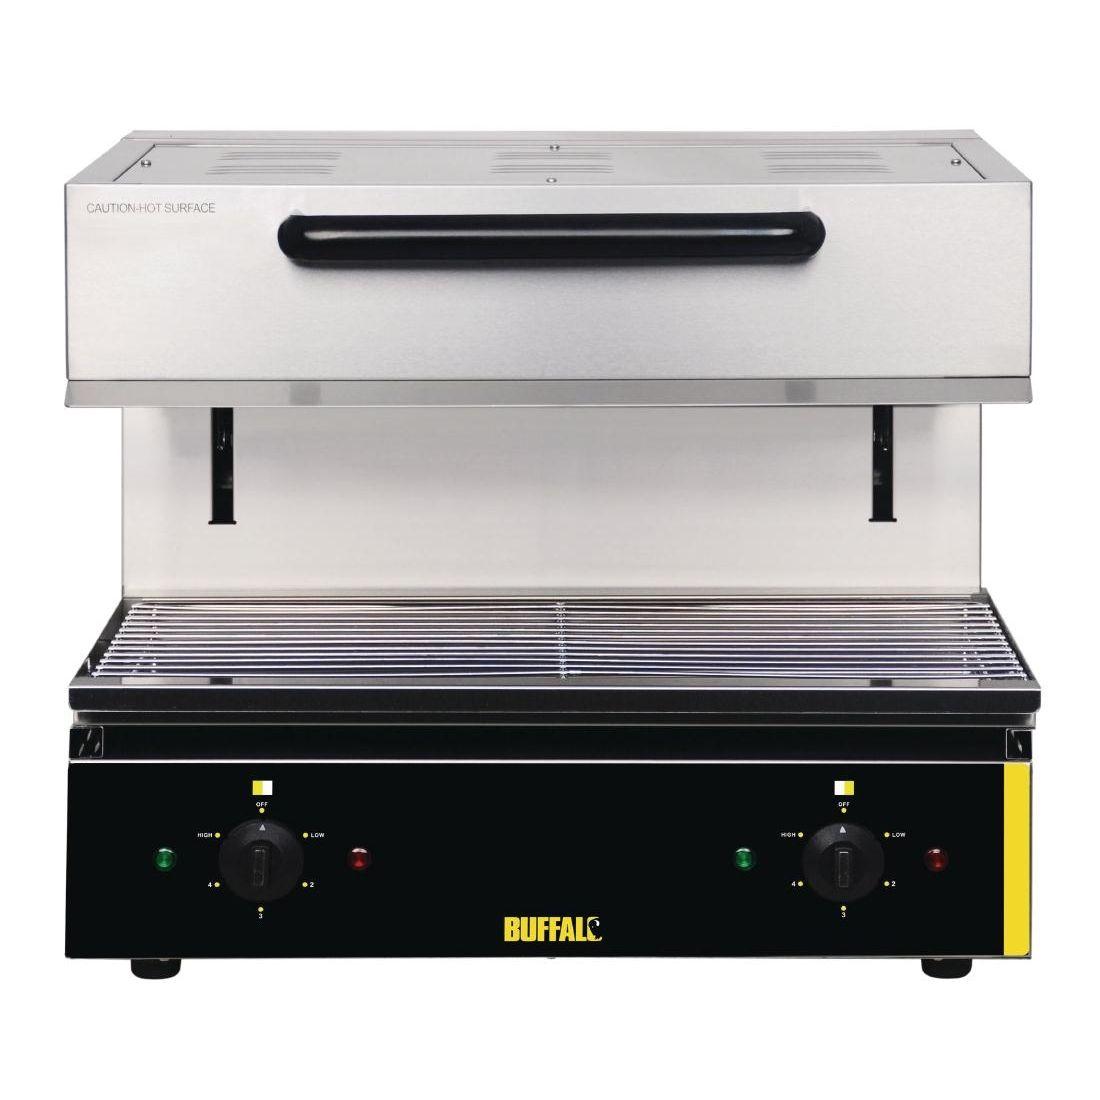 Buffalo Electric Adjustable Salamander Grill | Buffalo, Kitchen ...